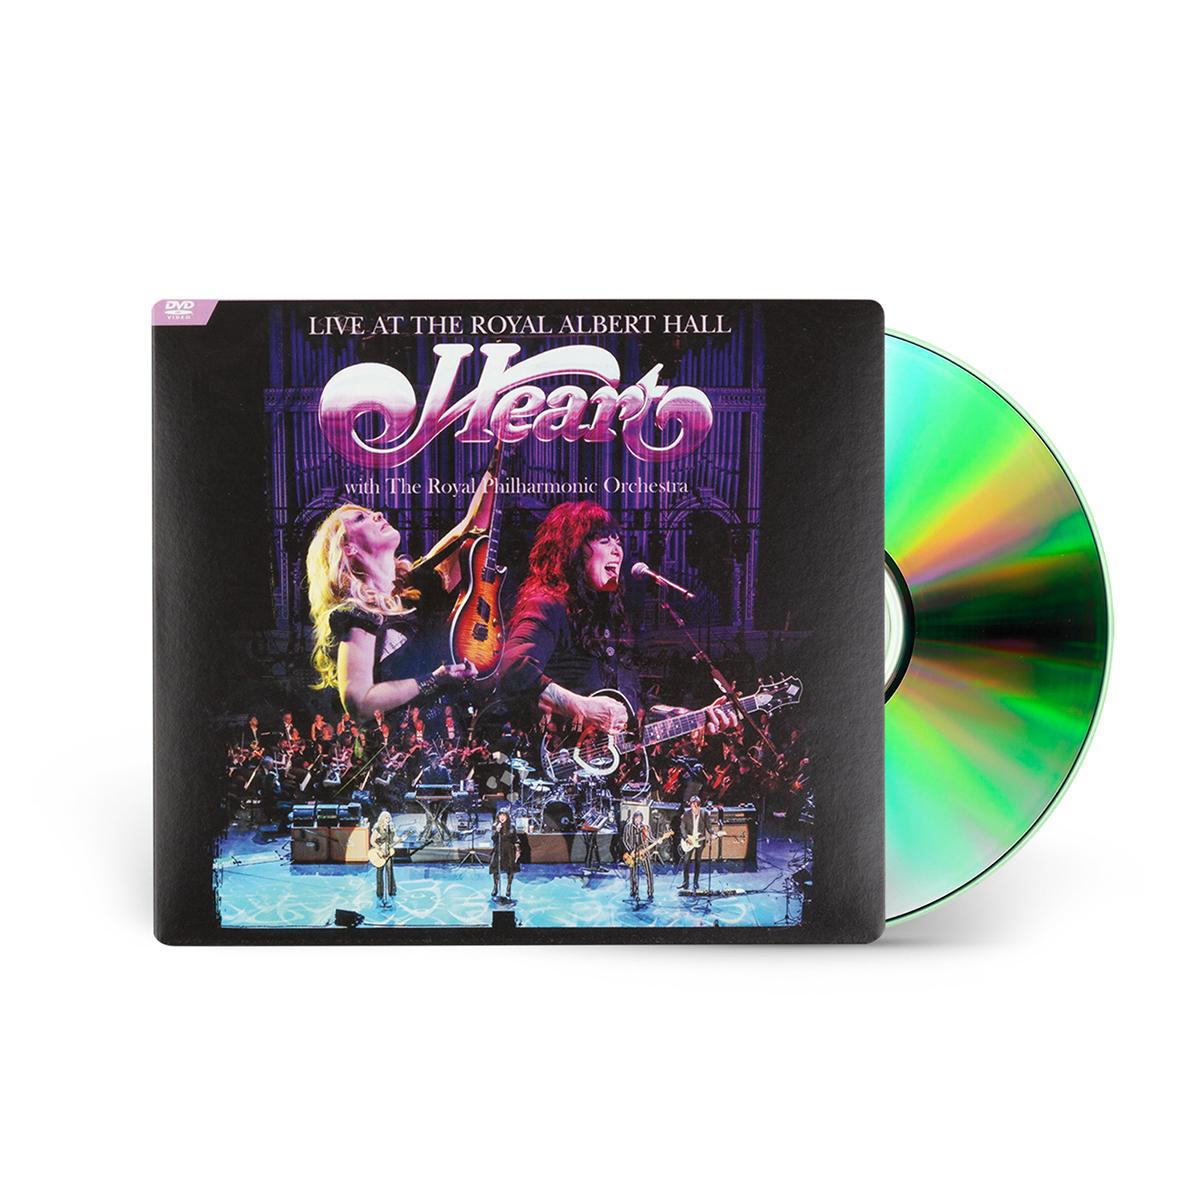 Live At The Royal Albert Hall DVD Blu-Ray